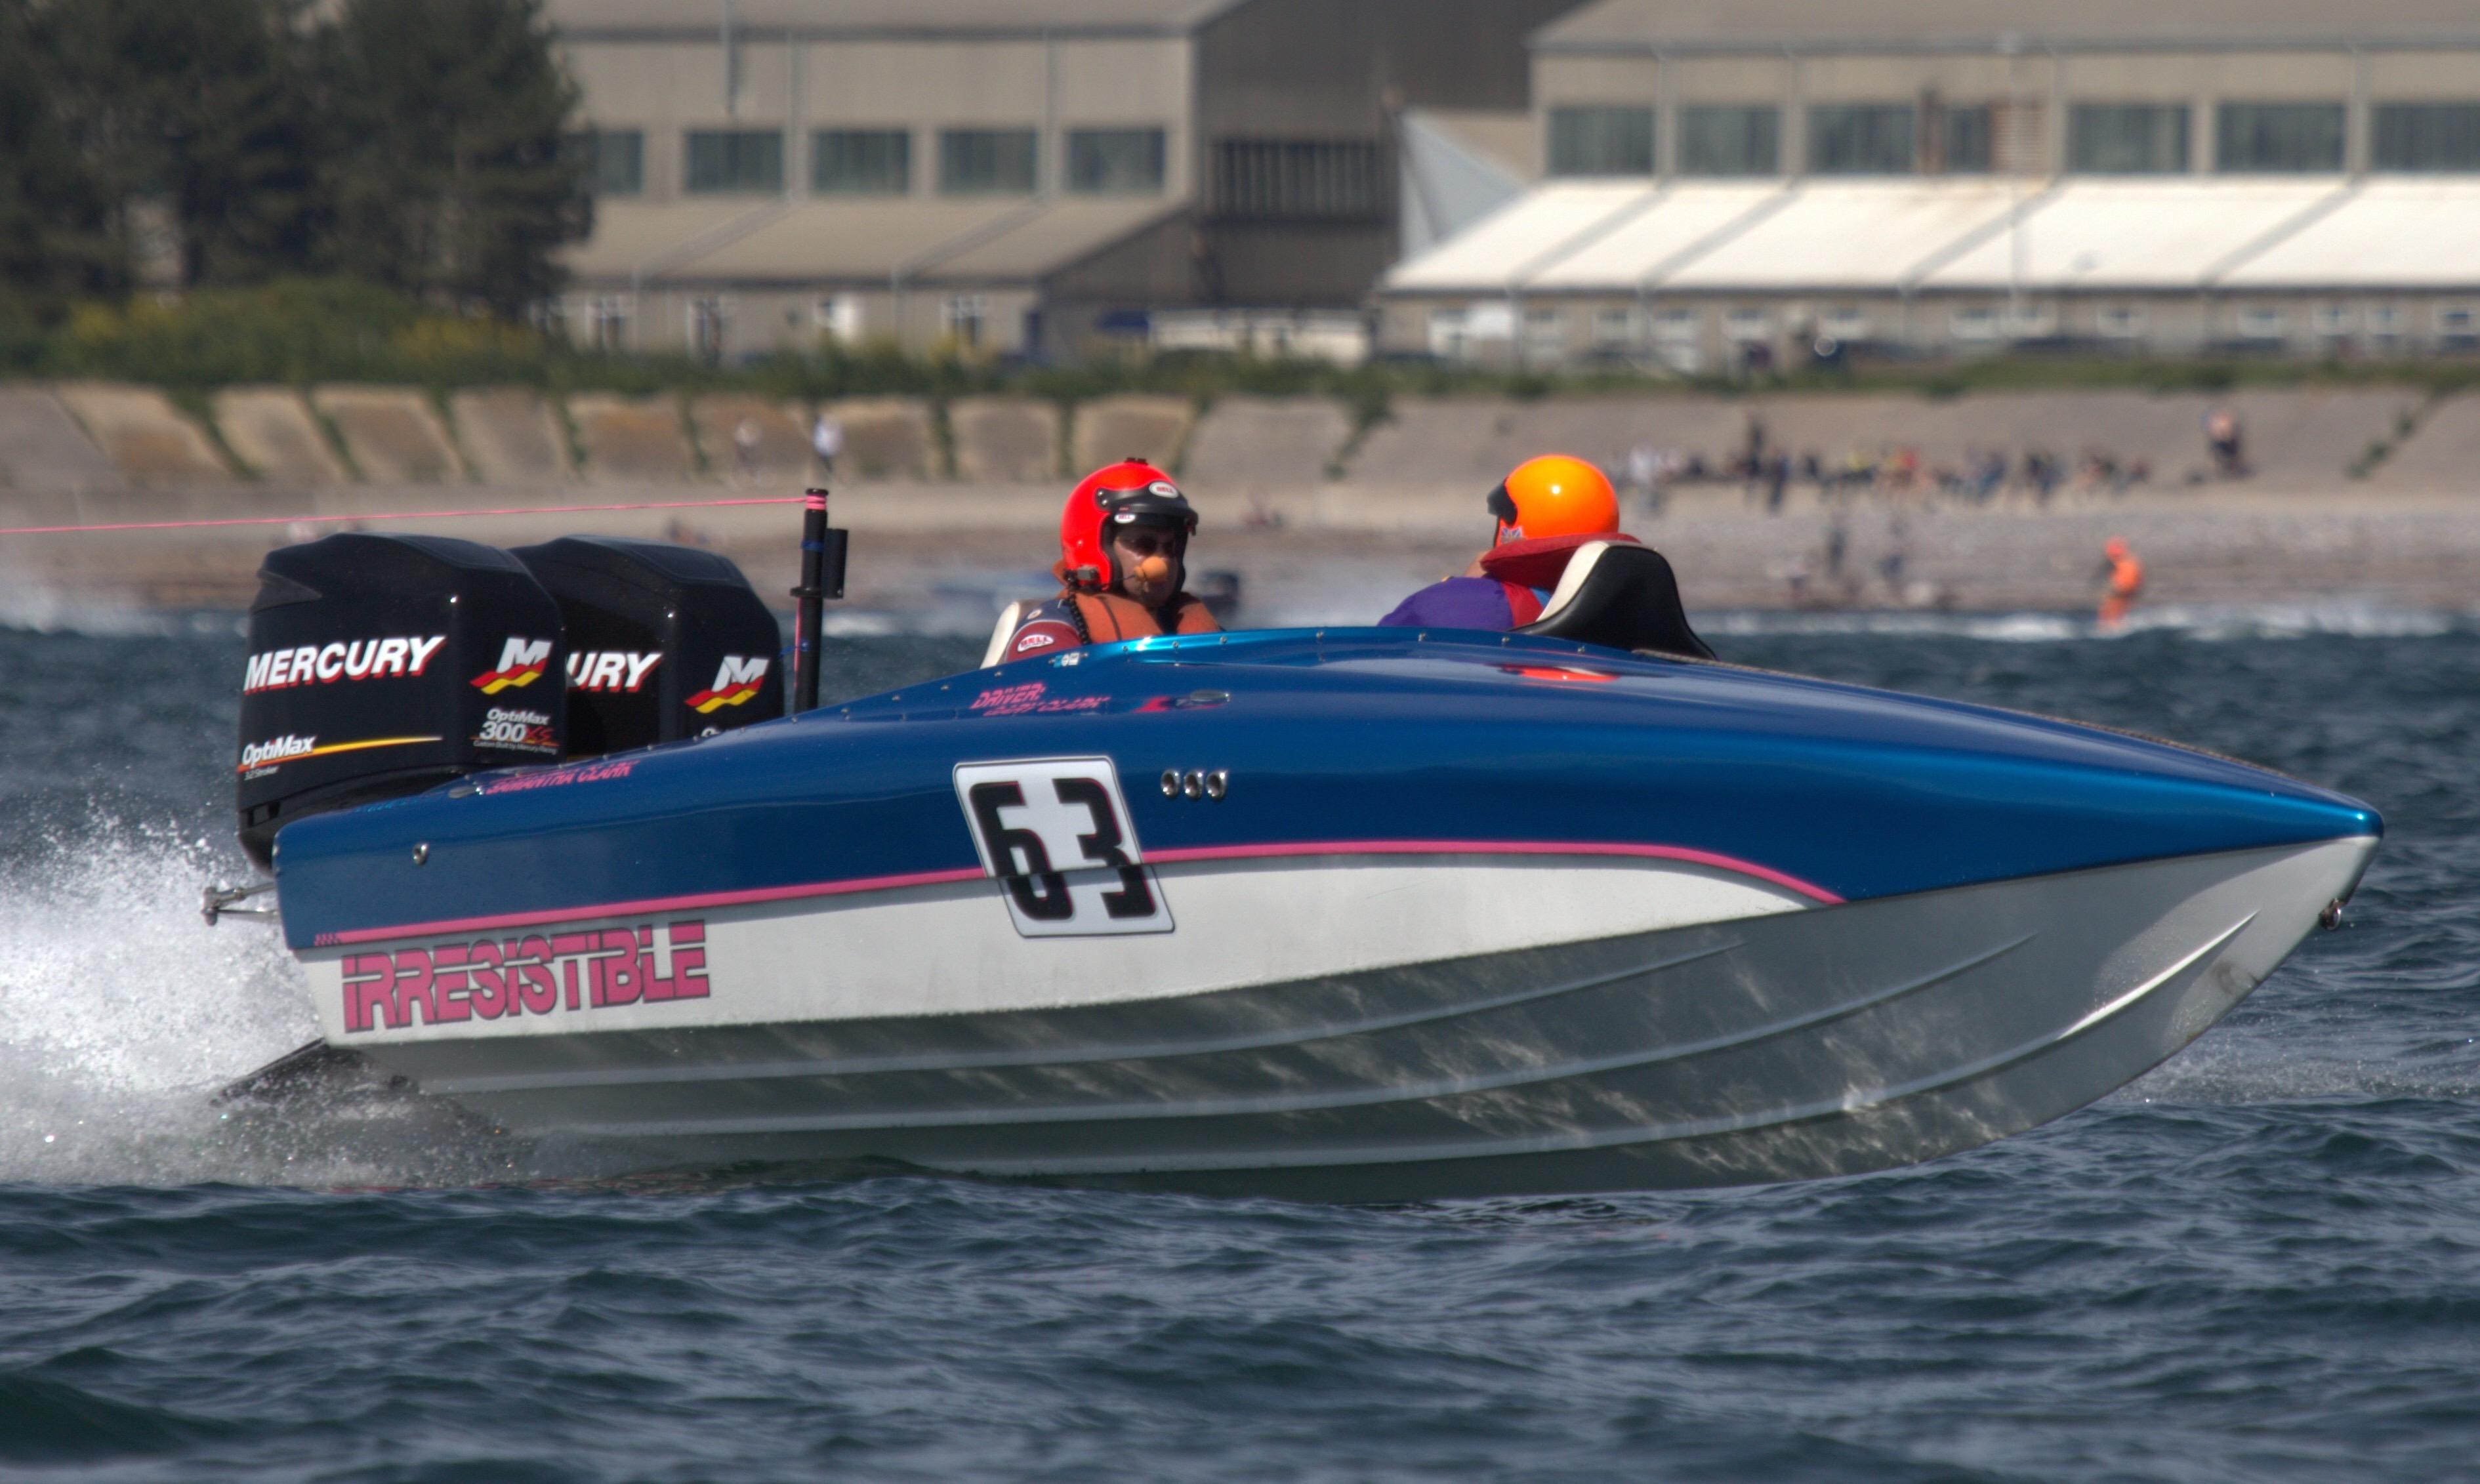 waterskier-boat-gary-clark-stephen-young-2